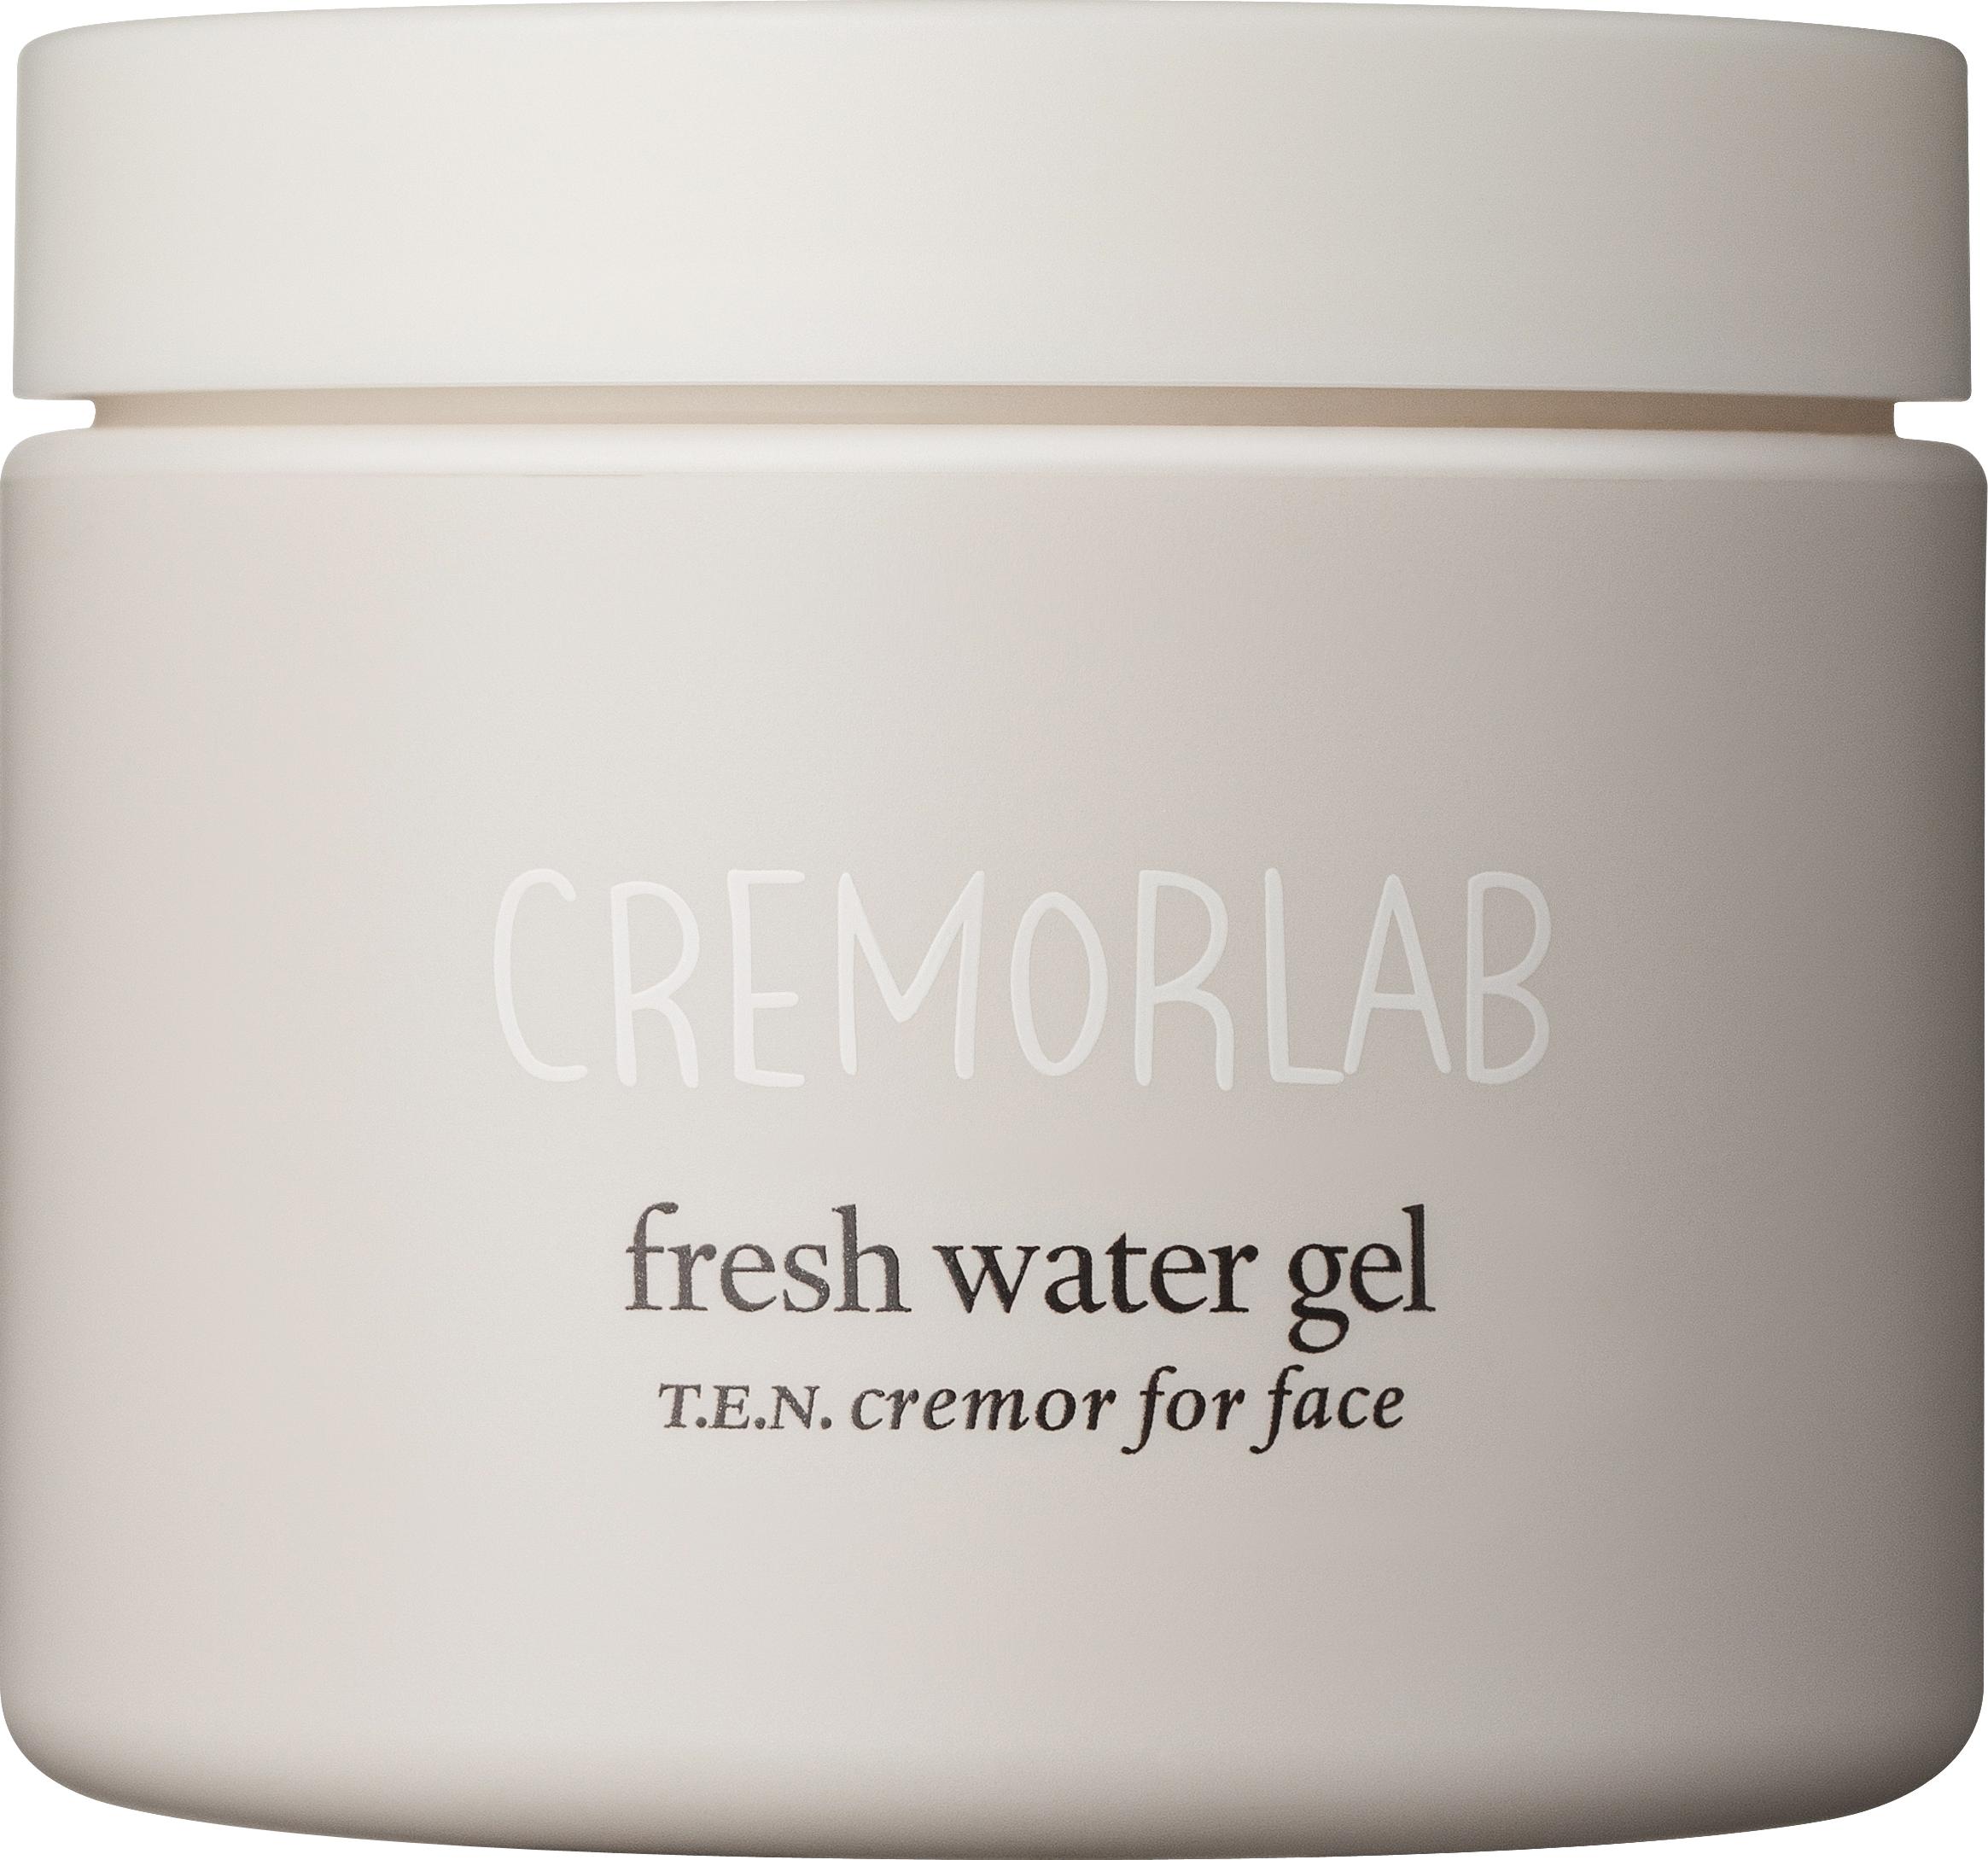 T.E.N. Cremor Fresh Water Gel 100ml